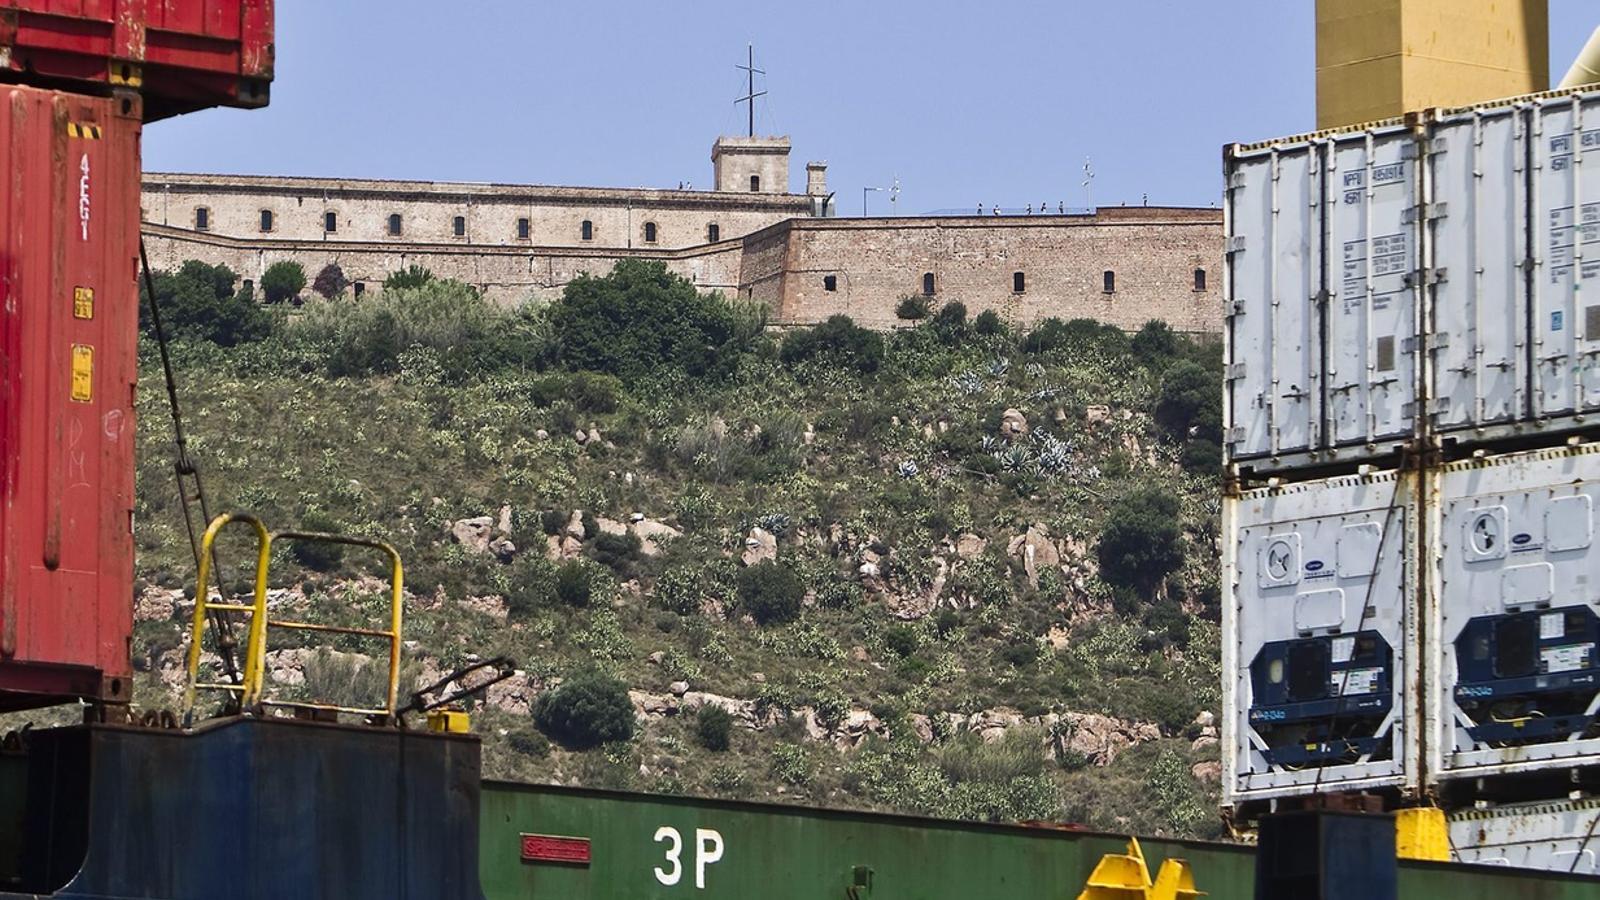 Polèmica a Montjuïc per una missa franquista